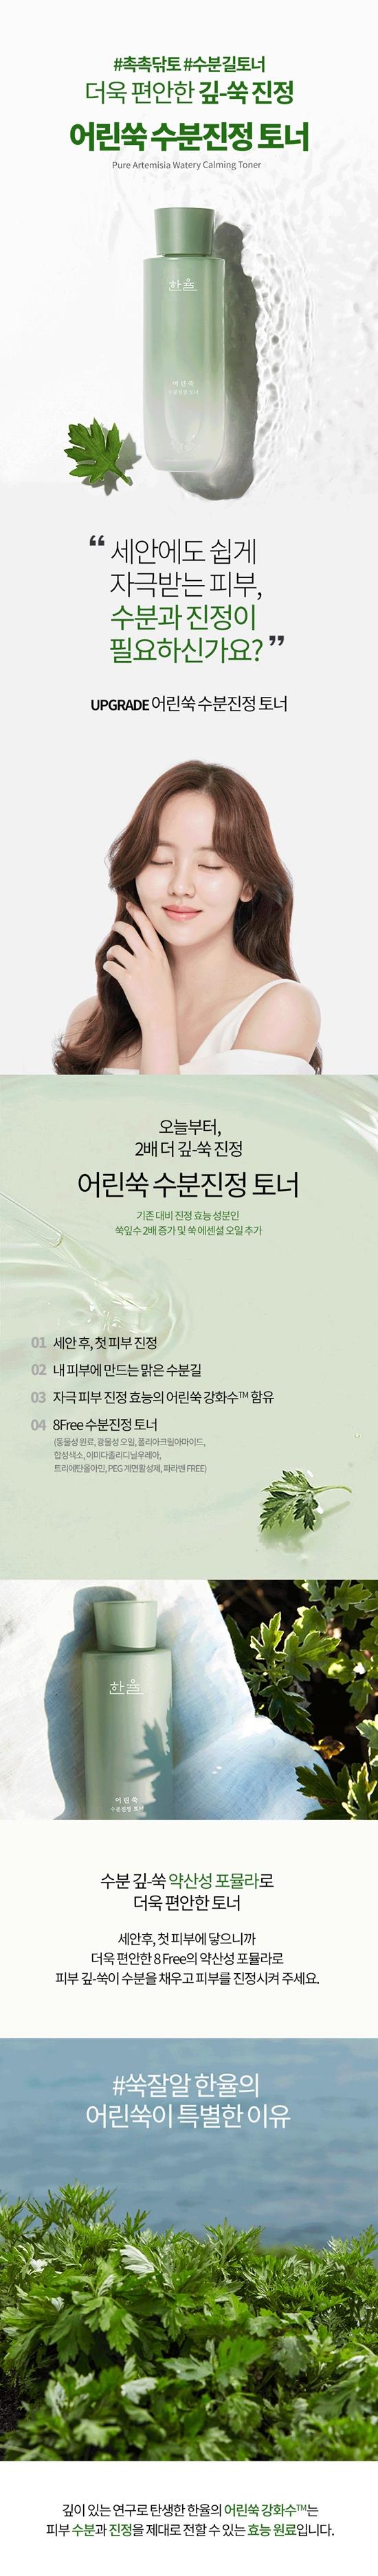 hanyul-pure-artemisia-calming-toner-2020-info.jpg